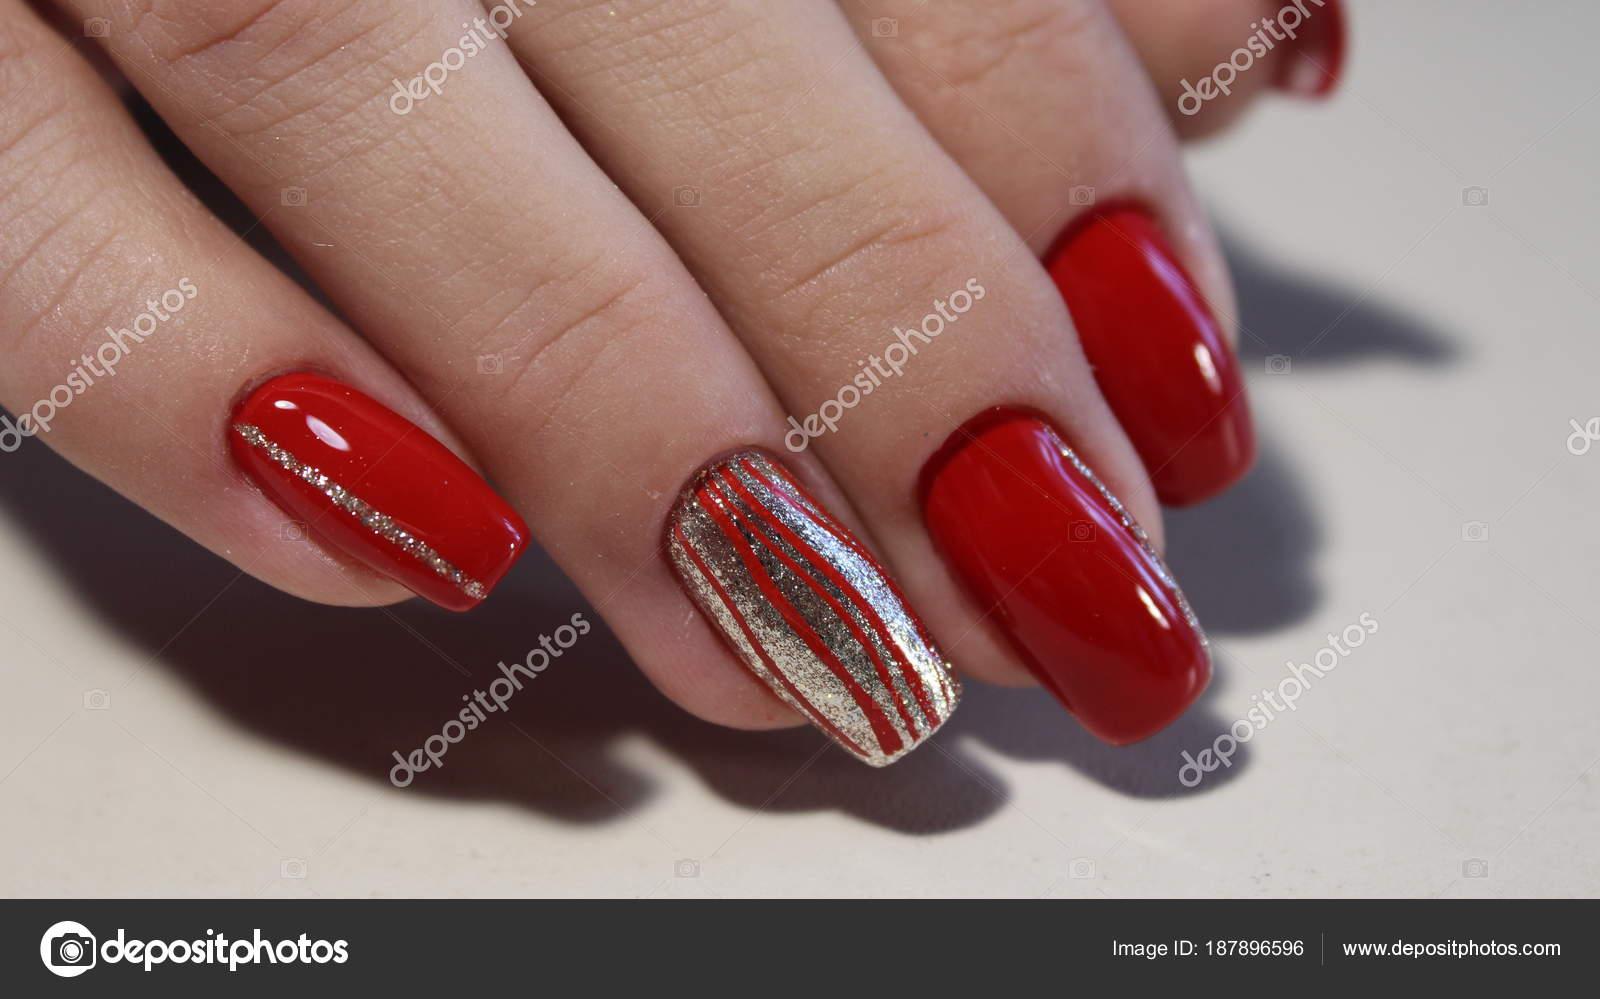 Nail designs red colors — Stock Photo © SmirMaxStock #187896596